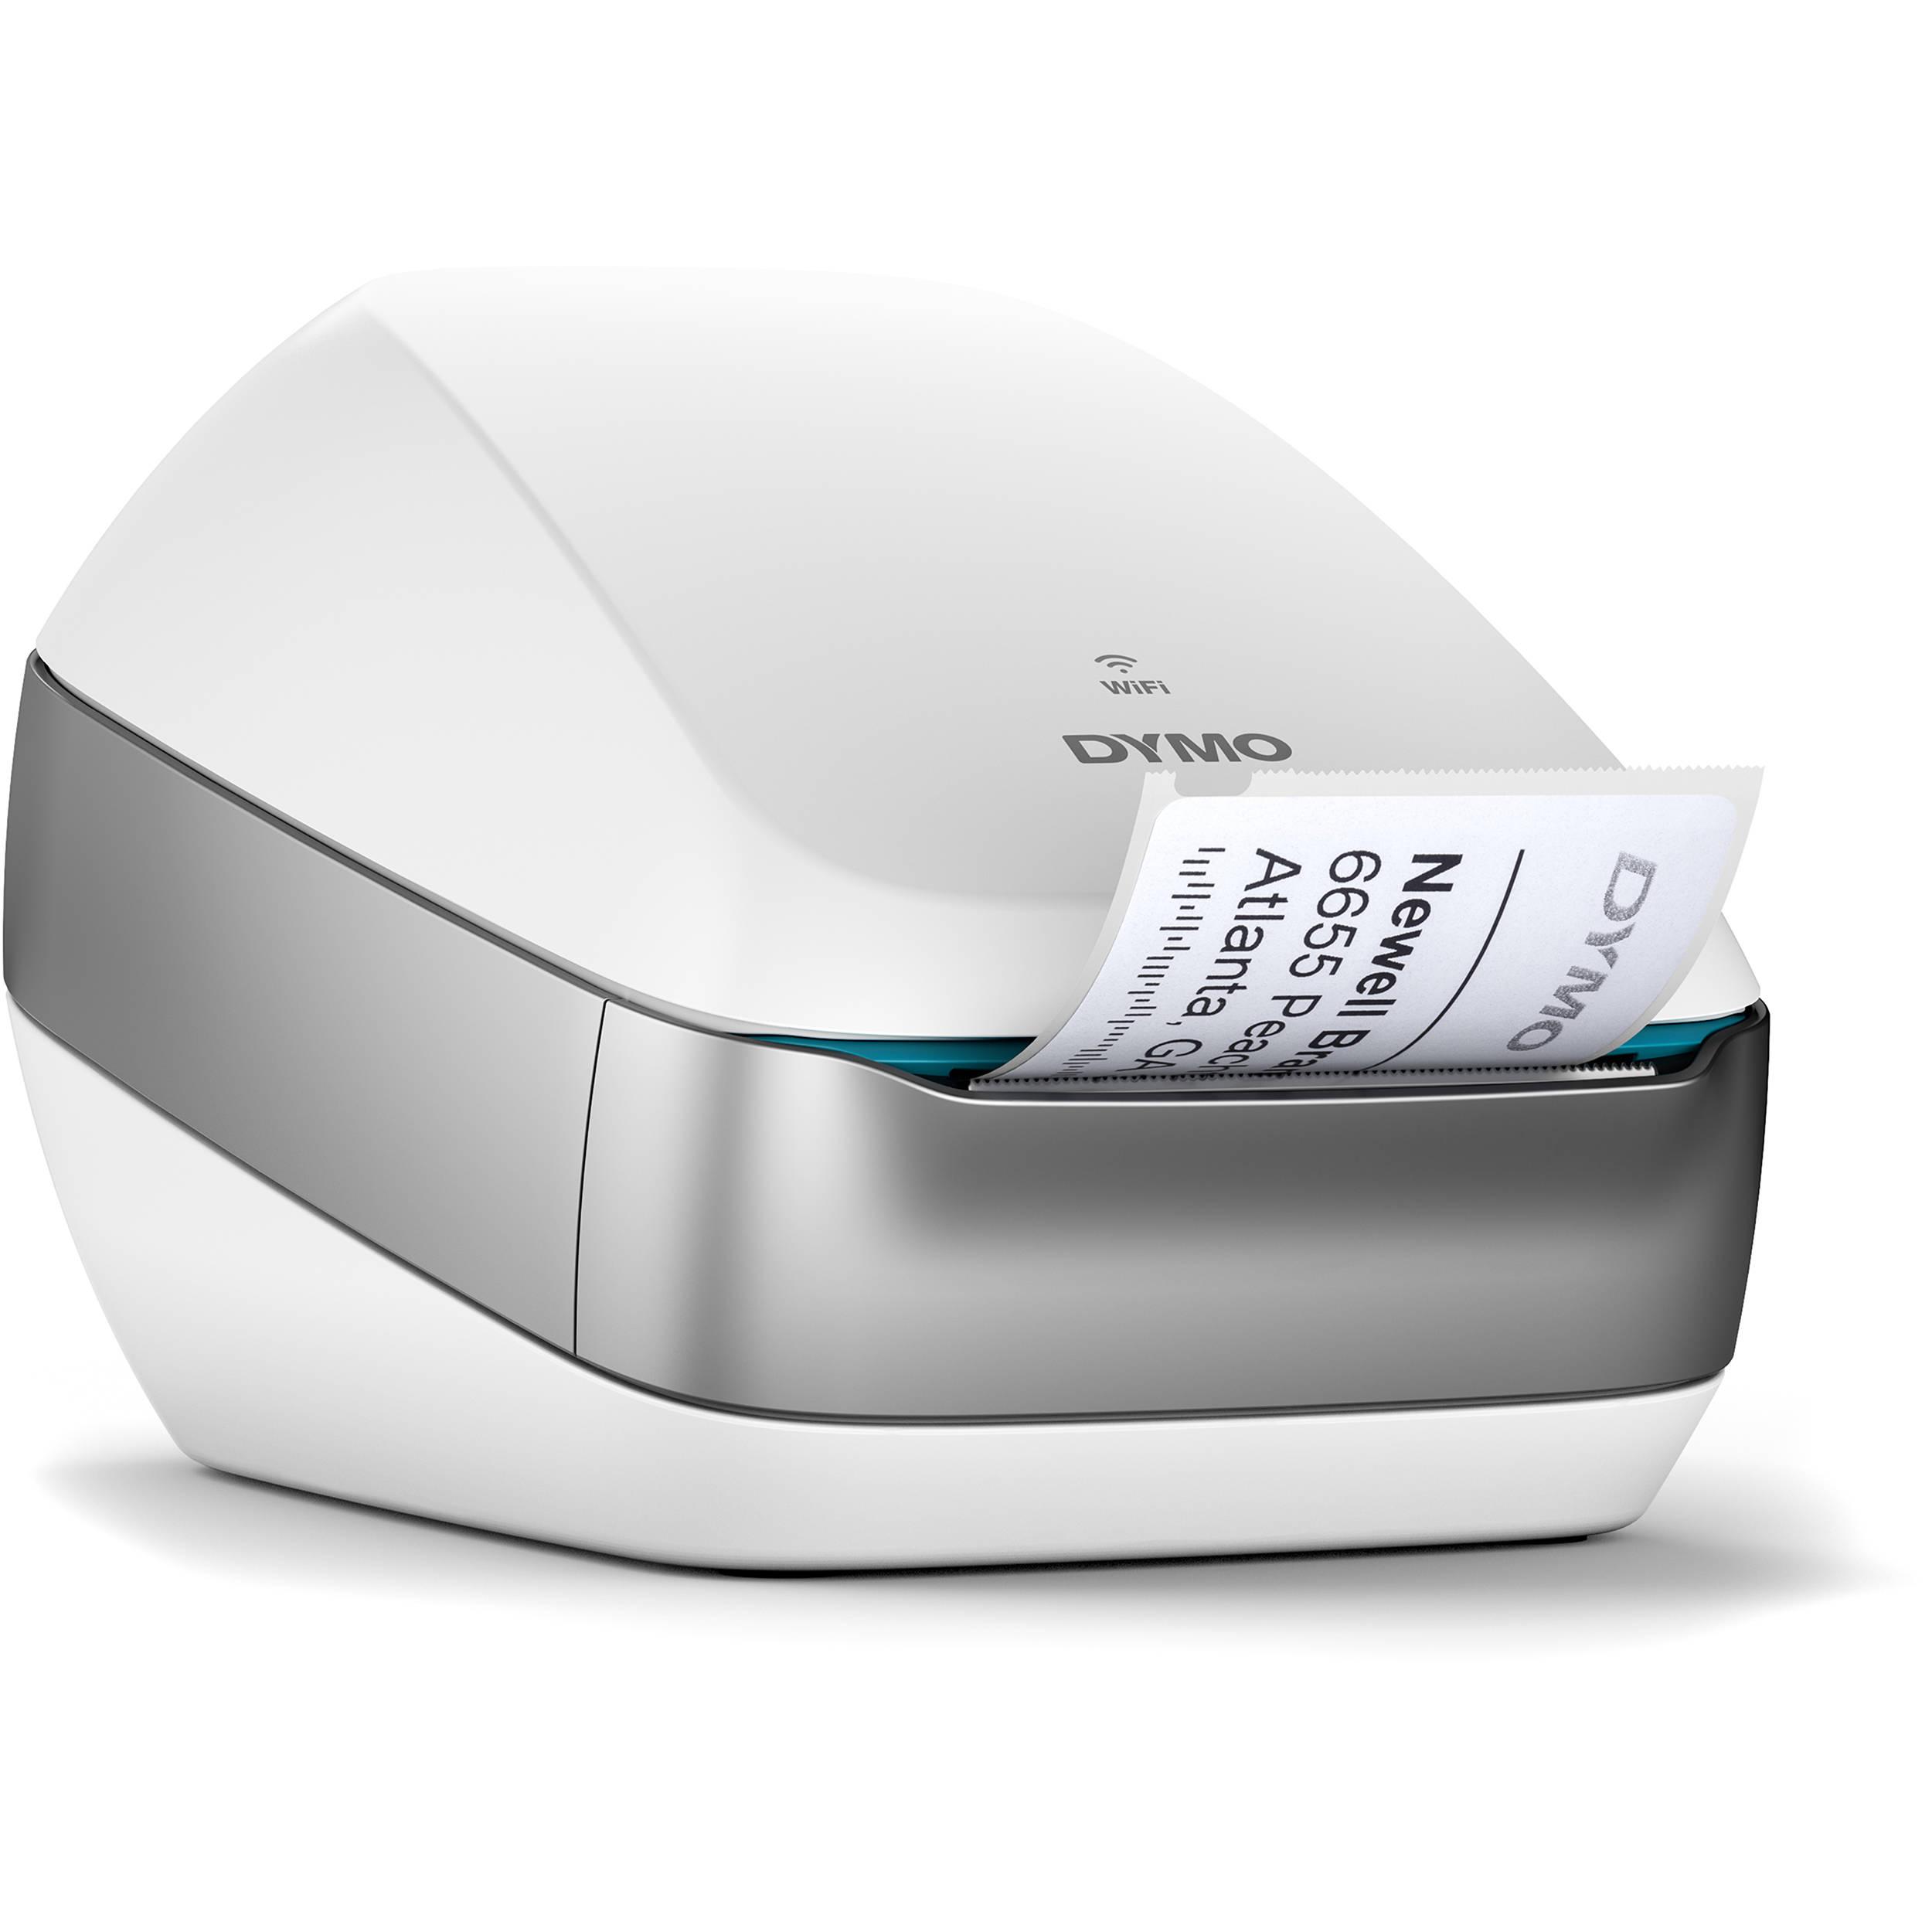 Dymo LabelWriter Wireless Label Printer (White)